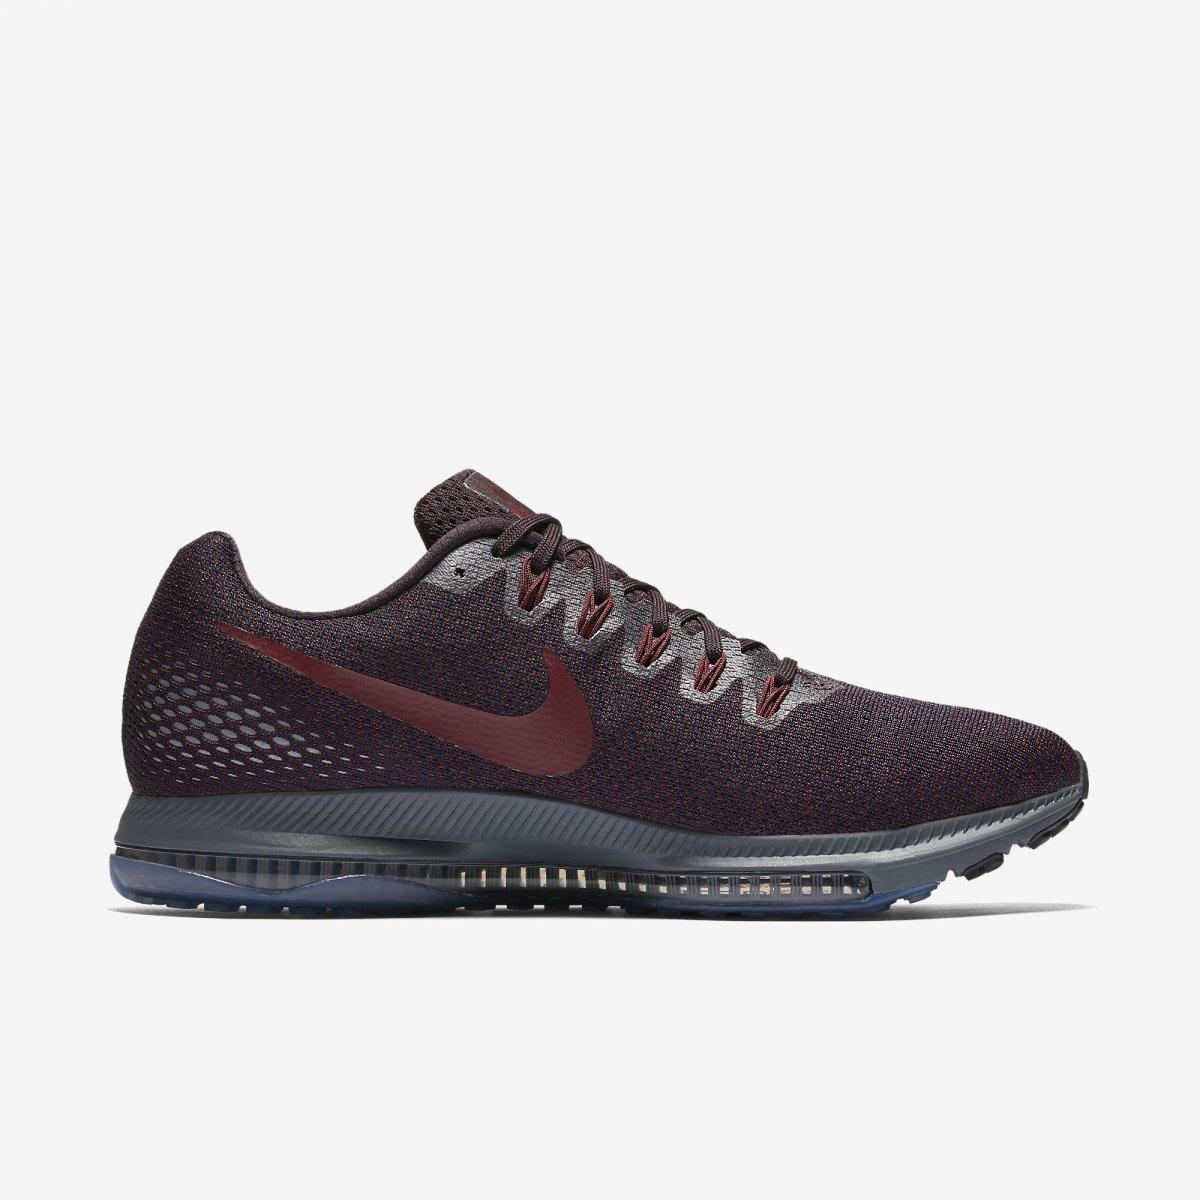 Tênis Masculino Nike Zoom All Out Low 878670-602 Vermelho feff9495164f3